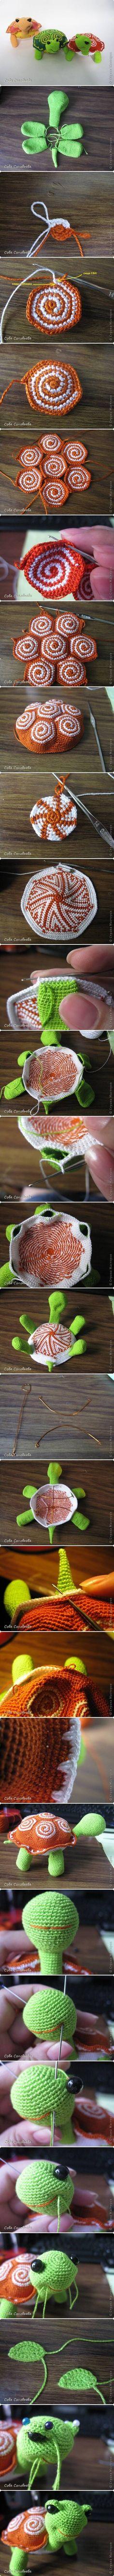 Luty Artes Crochet: Tartaruga de crochê + PAP                                                                                                                                                      Mais